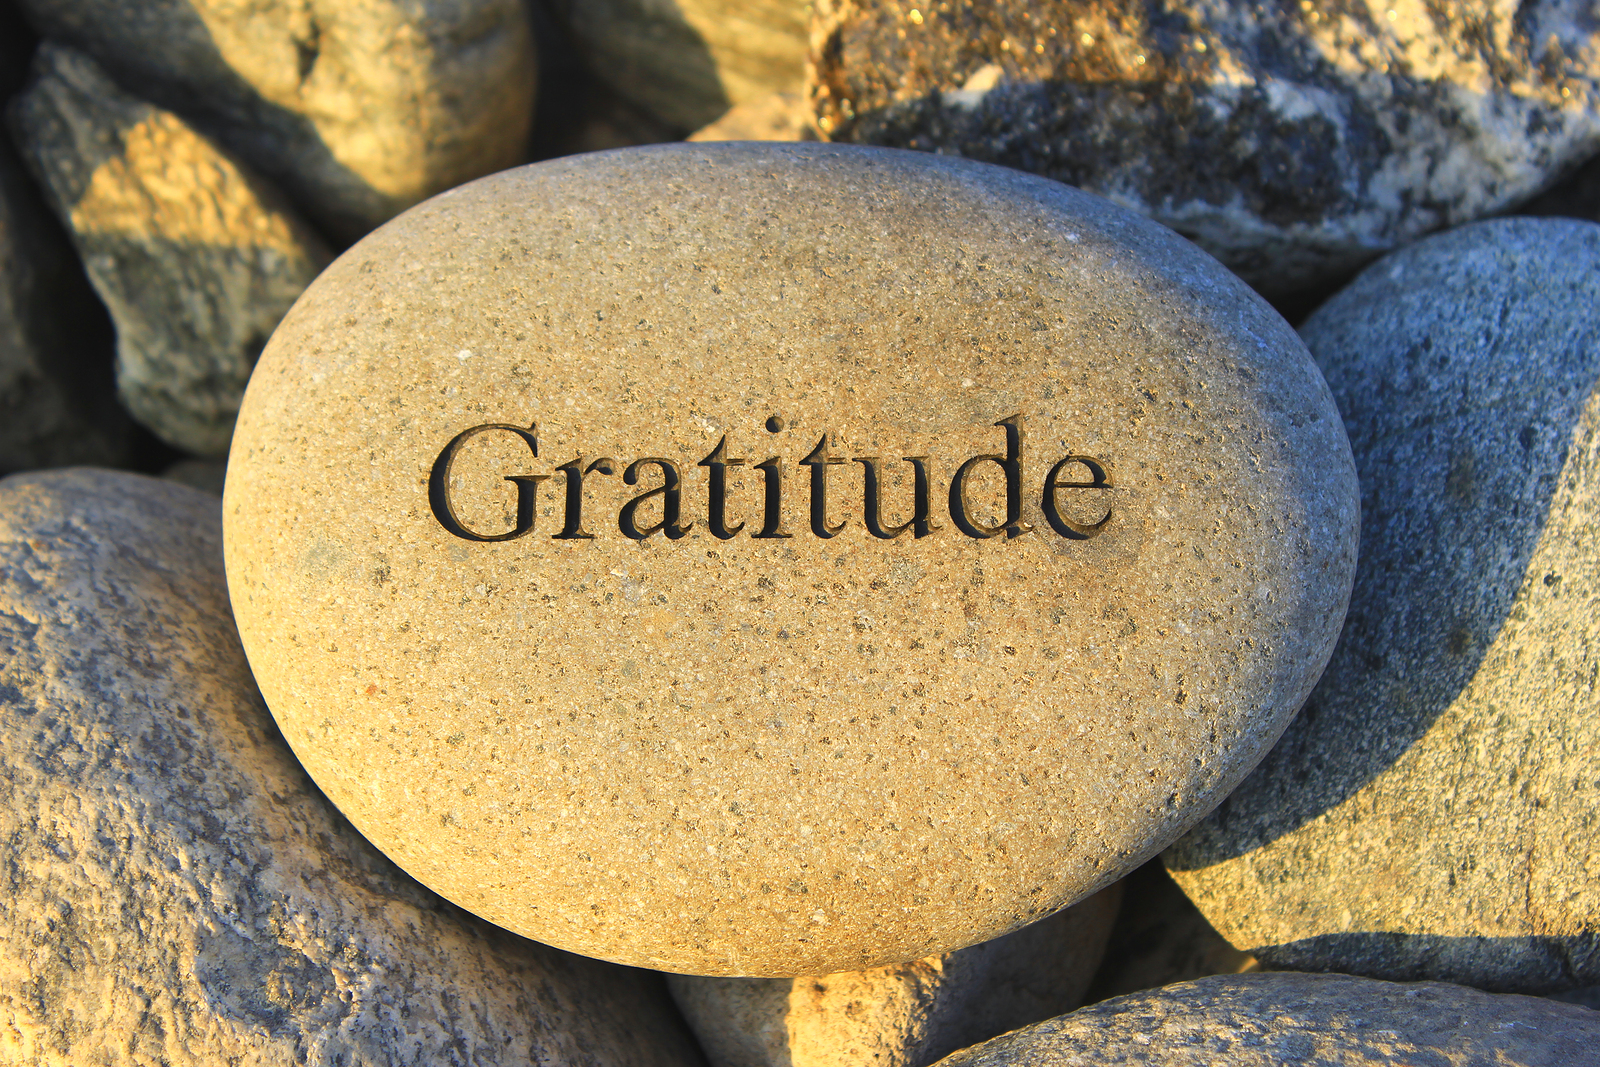 Gratitude-rock.jpg